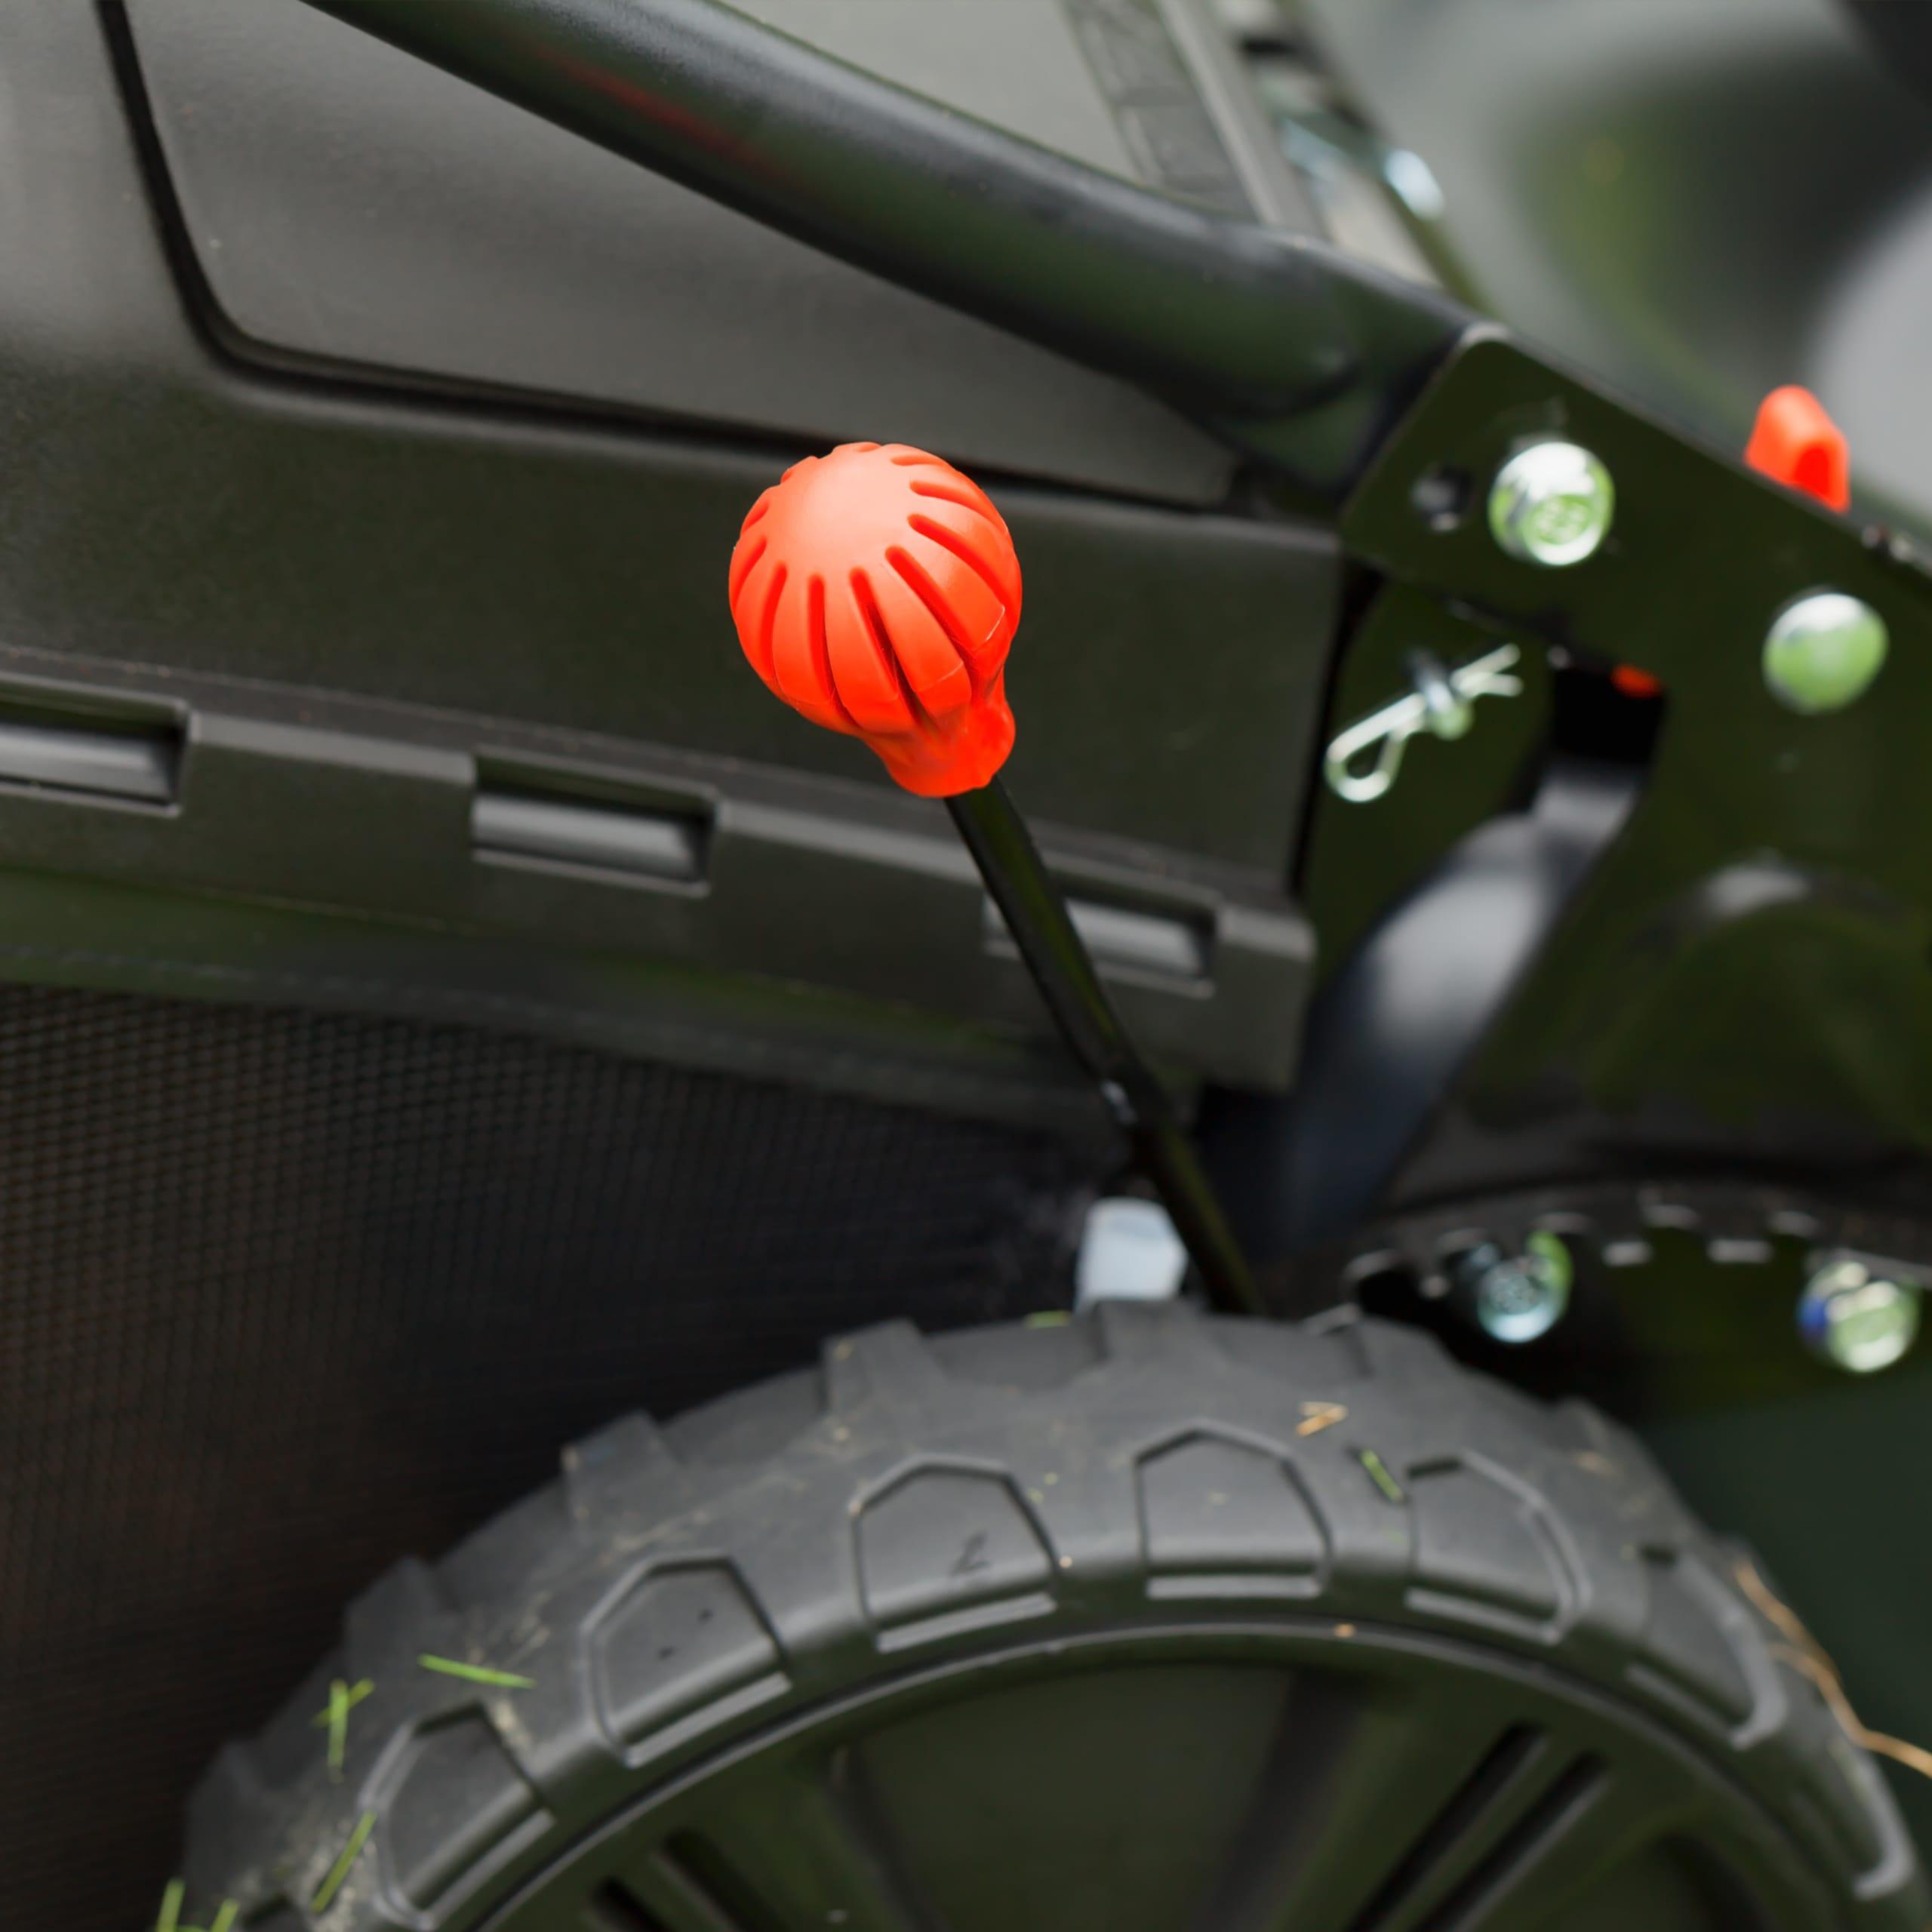 mower blade height adjustment lever